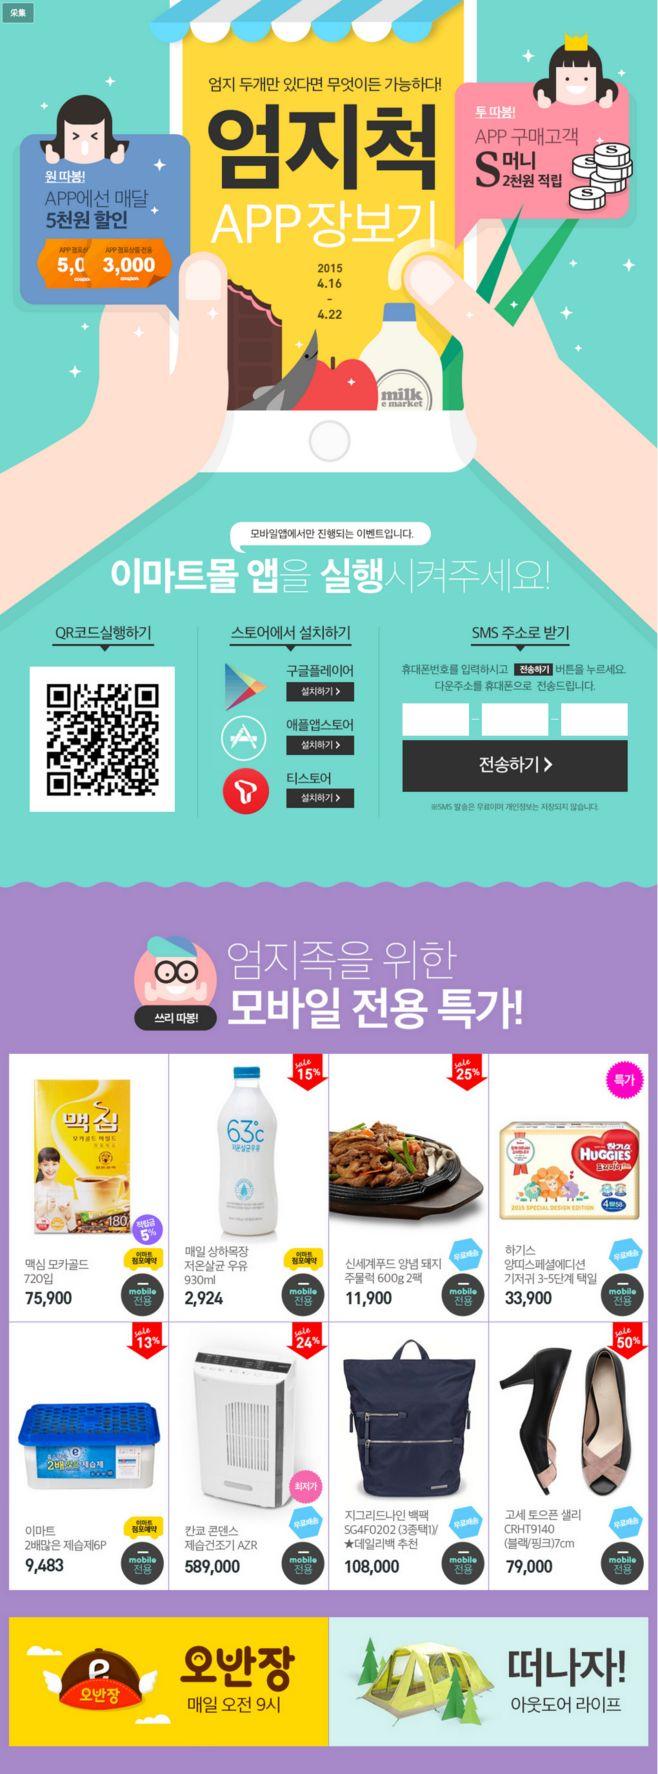 ssg.com / shinsegaemall.com / emartmall.com / promotion / event / 신세계몰 / 이마트몰 / 프로모션 / 이벤트페이지